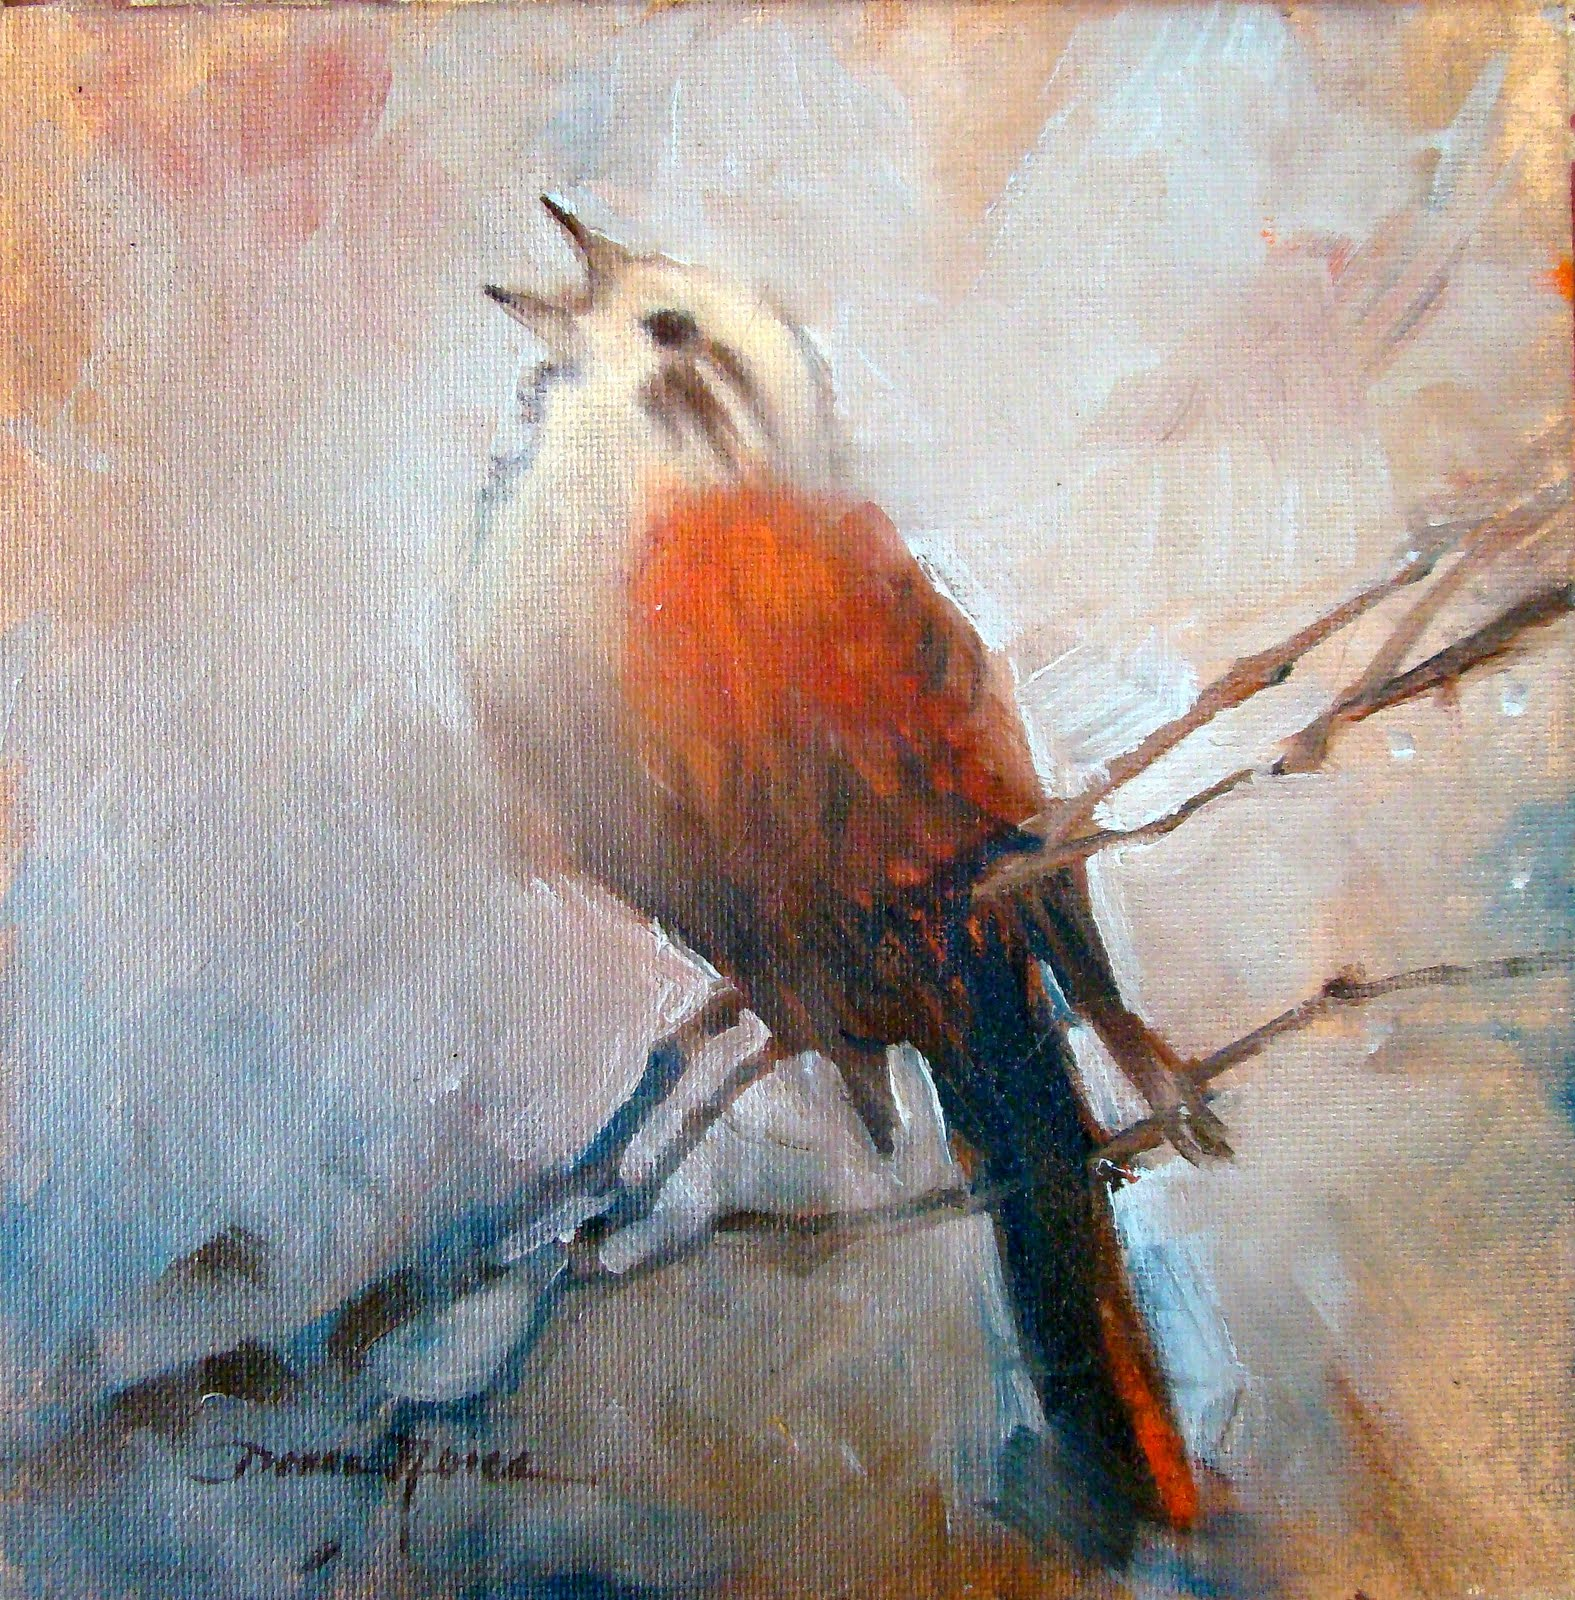 Donna carlisle noice celebrating life in paint